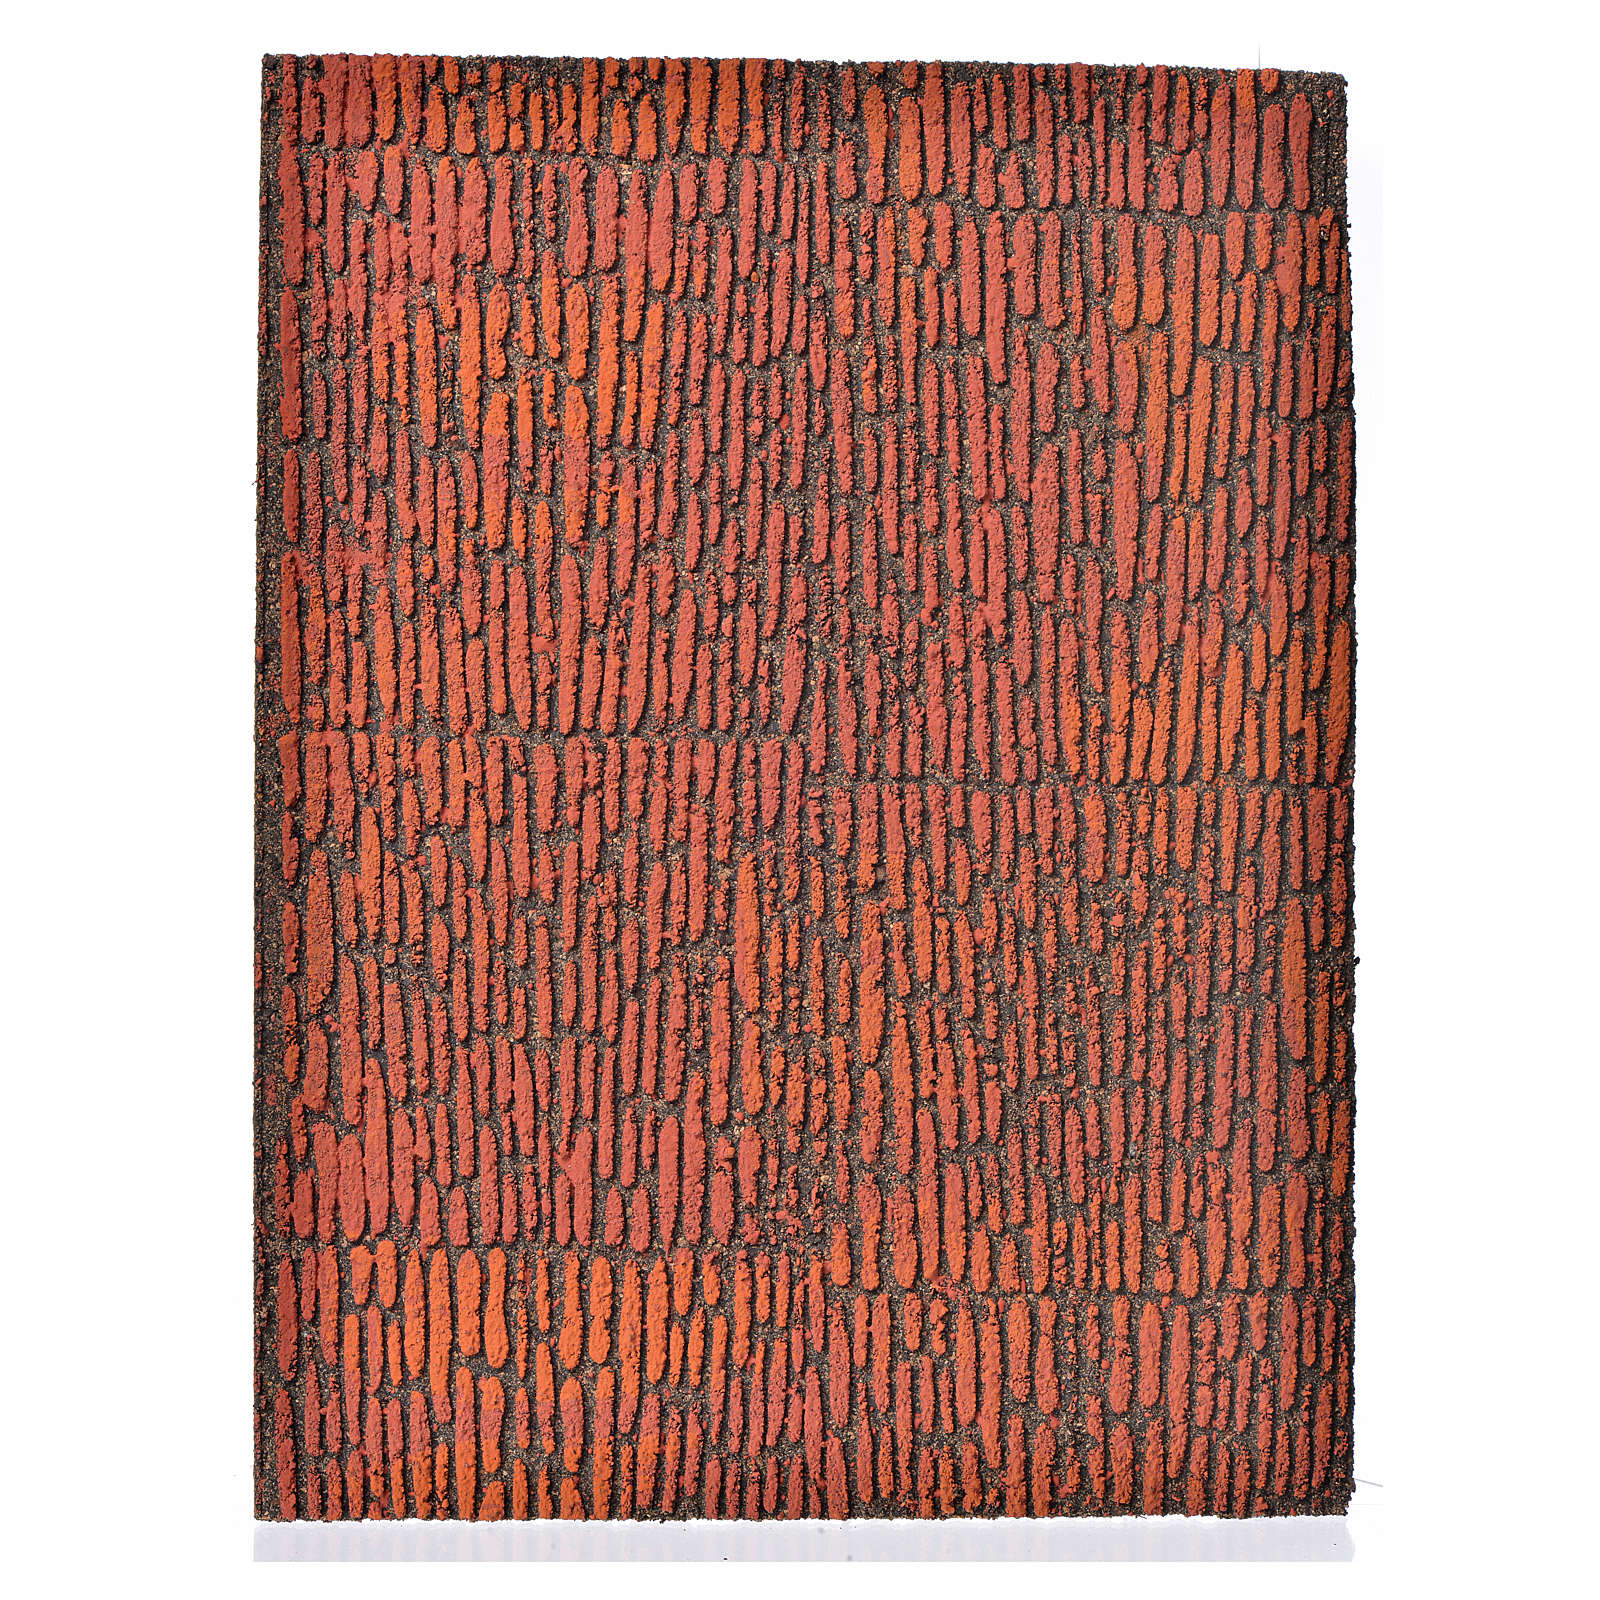 Nativity accessory, cork panel, Roman wall 36x23x1cm 4